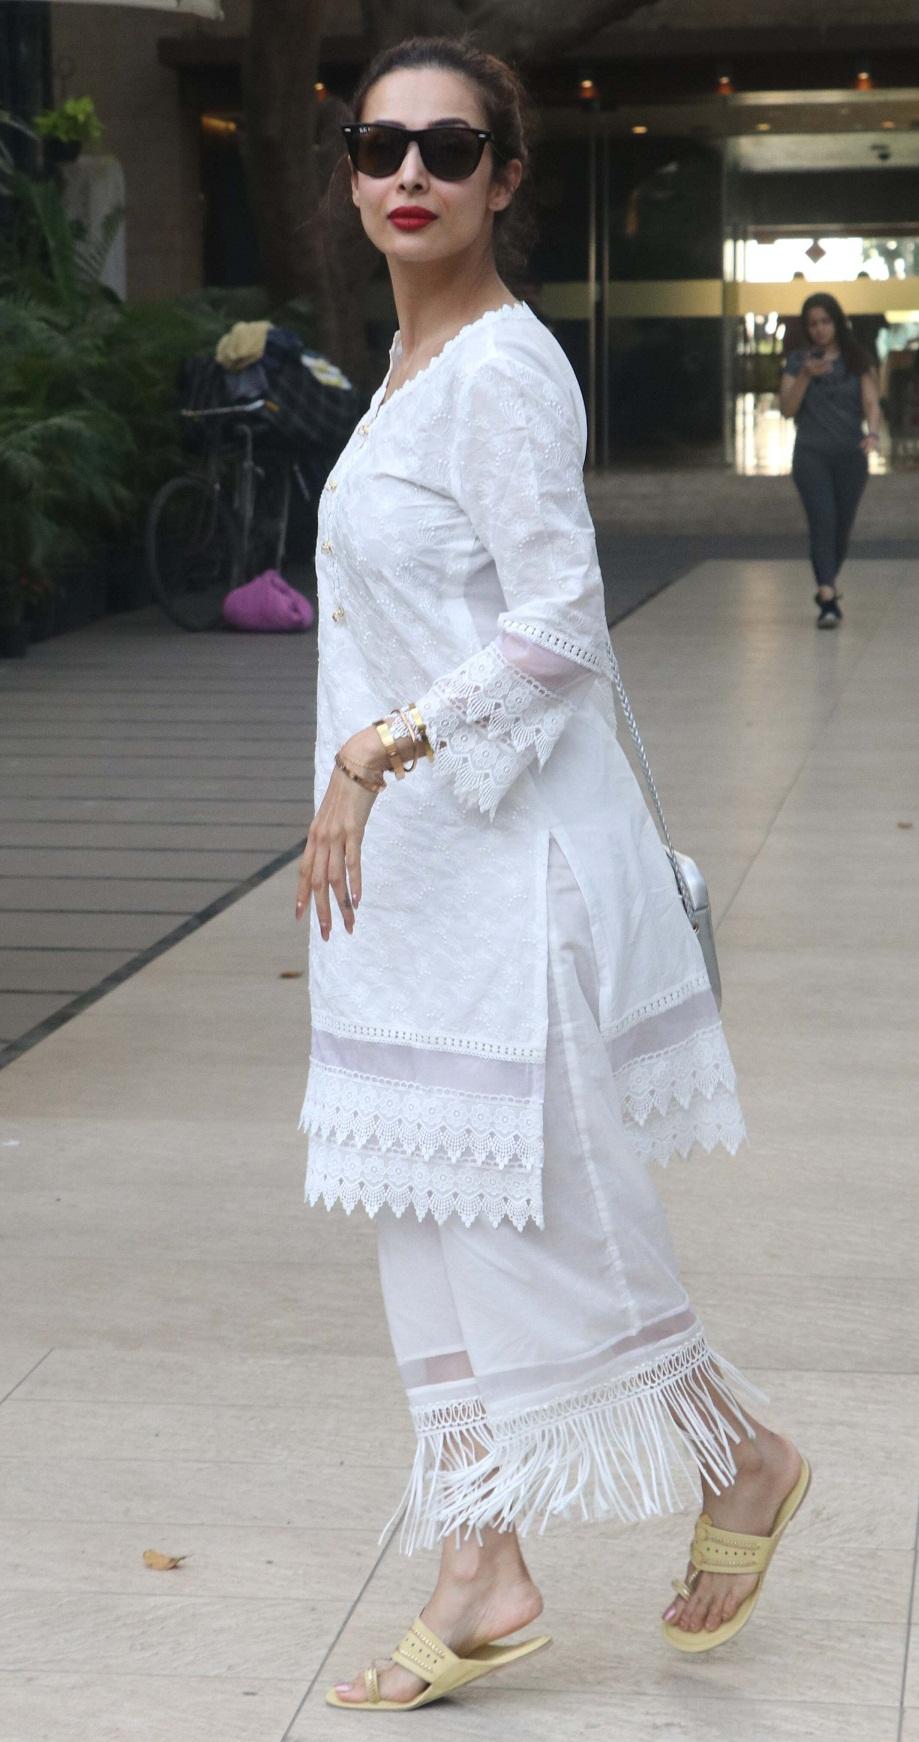 Bollywood Tadka, करिश्मा कपूर इमेज, करिश्मा कपूर फोटो, करिश्मा कपूर पिक्चर